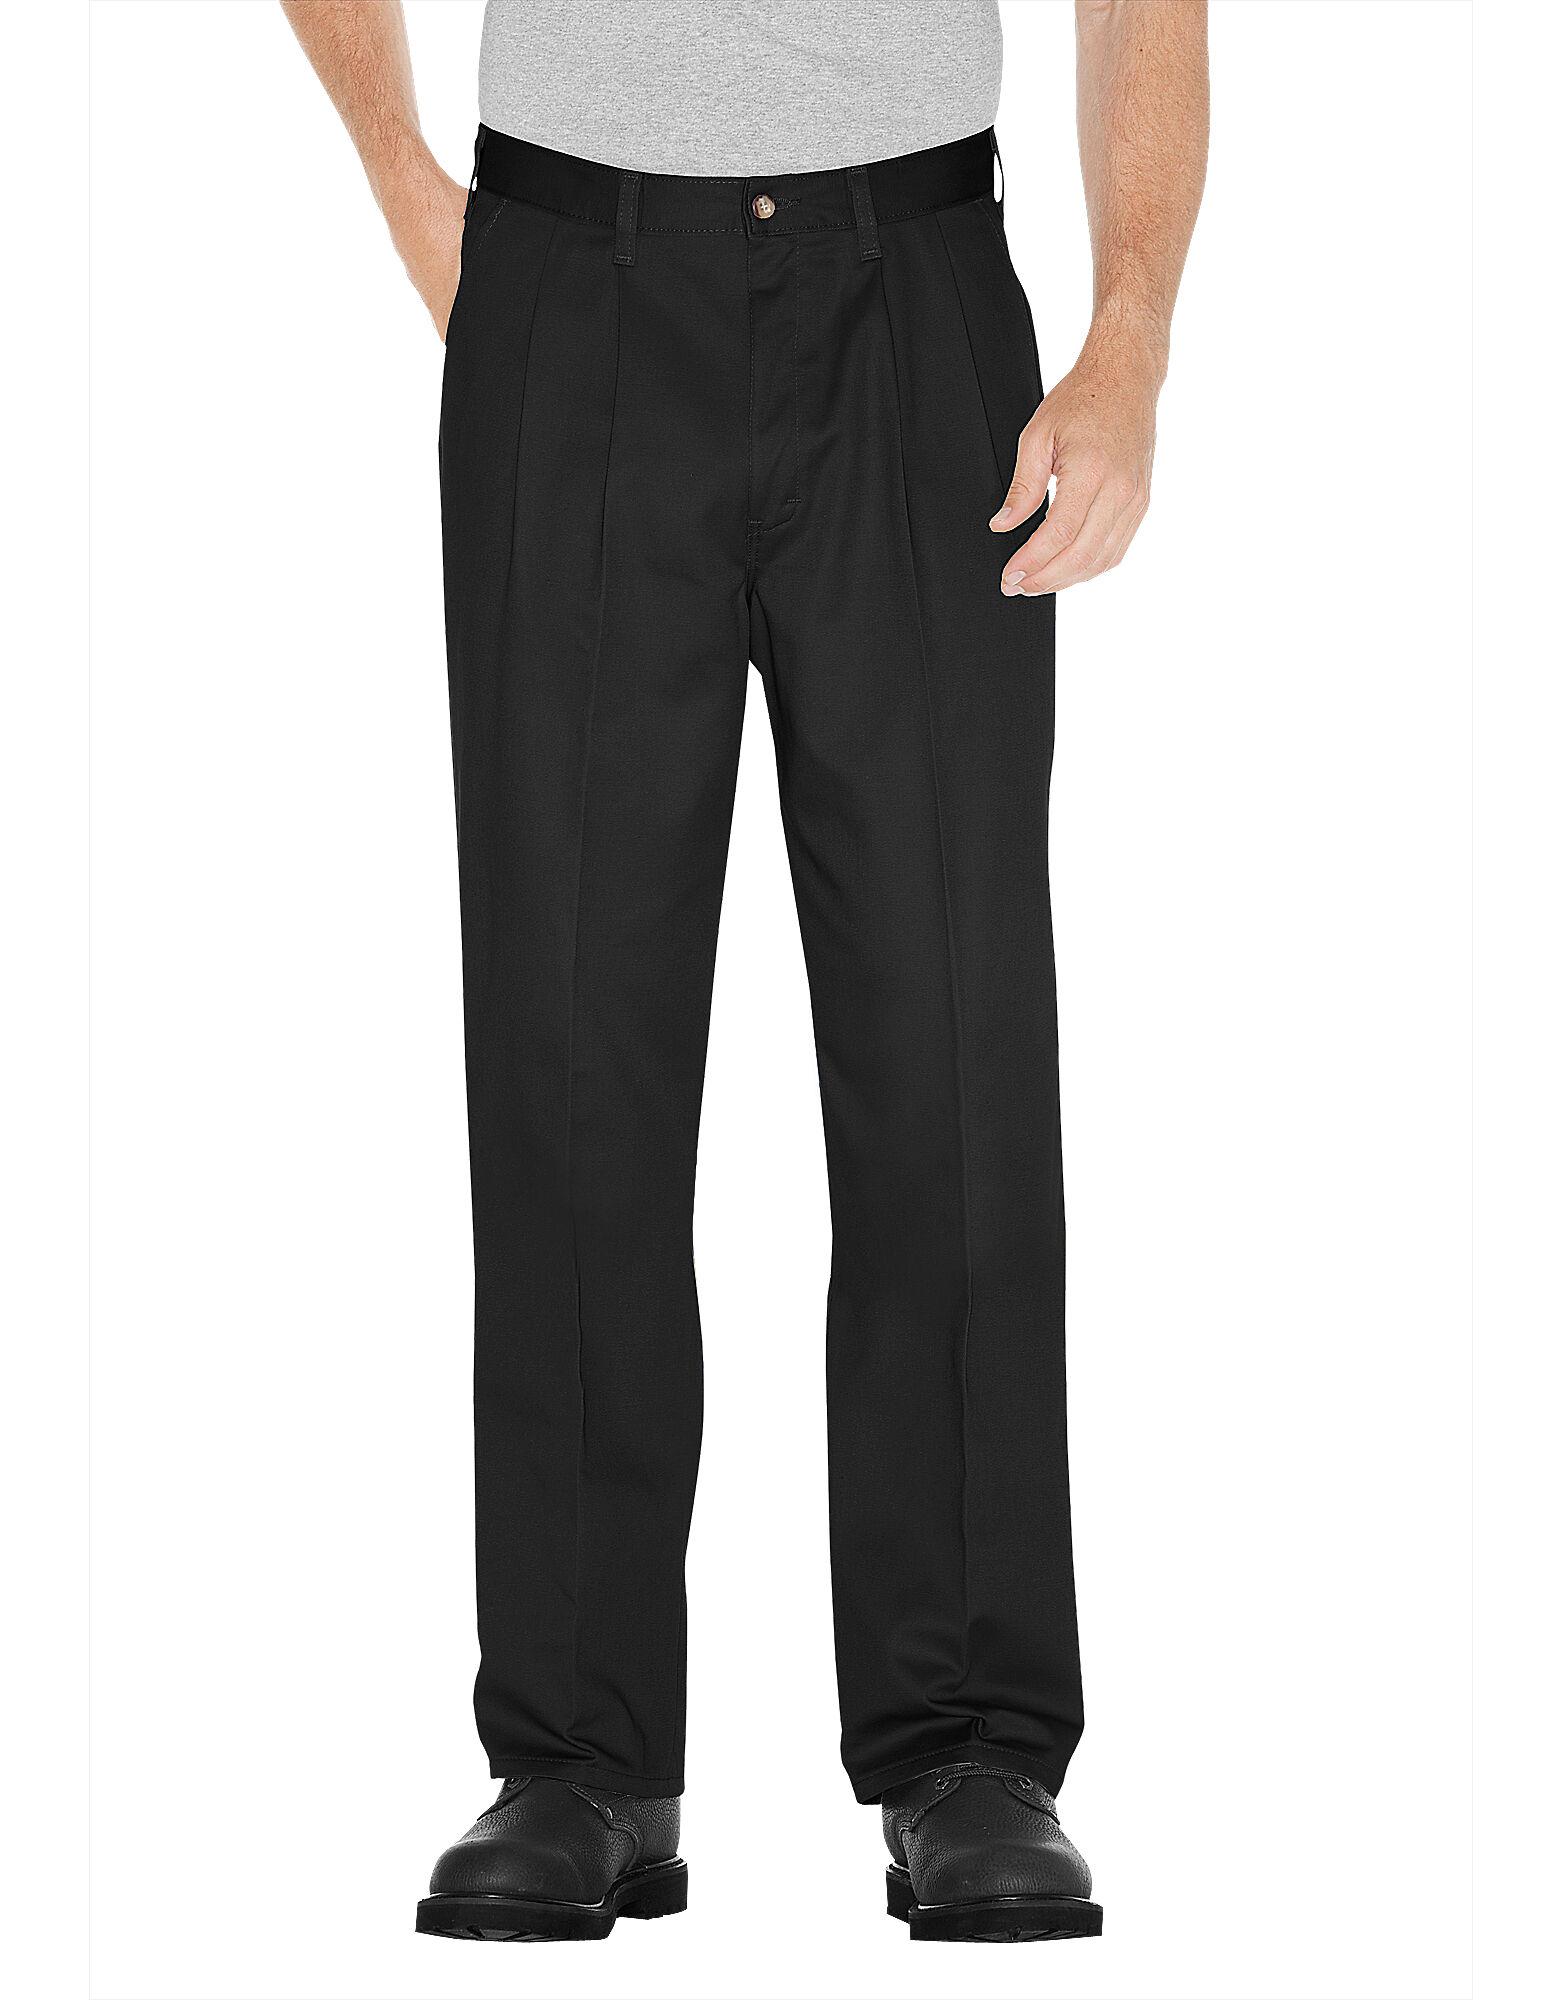 Who Should Wear Pleated Pants